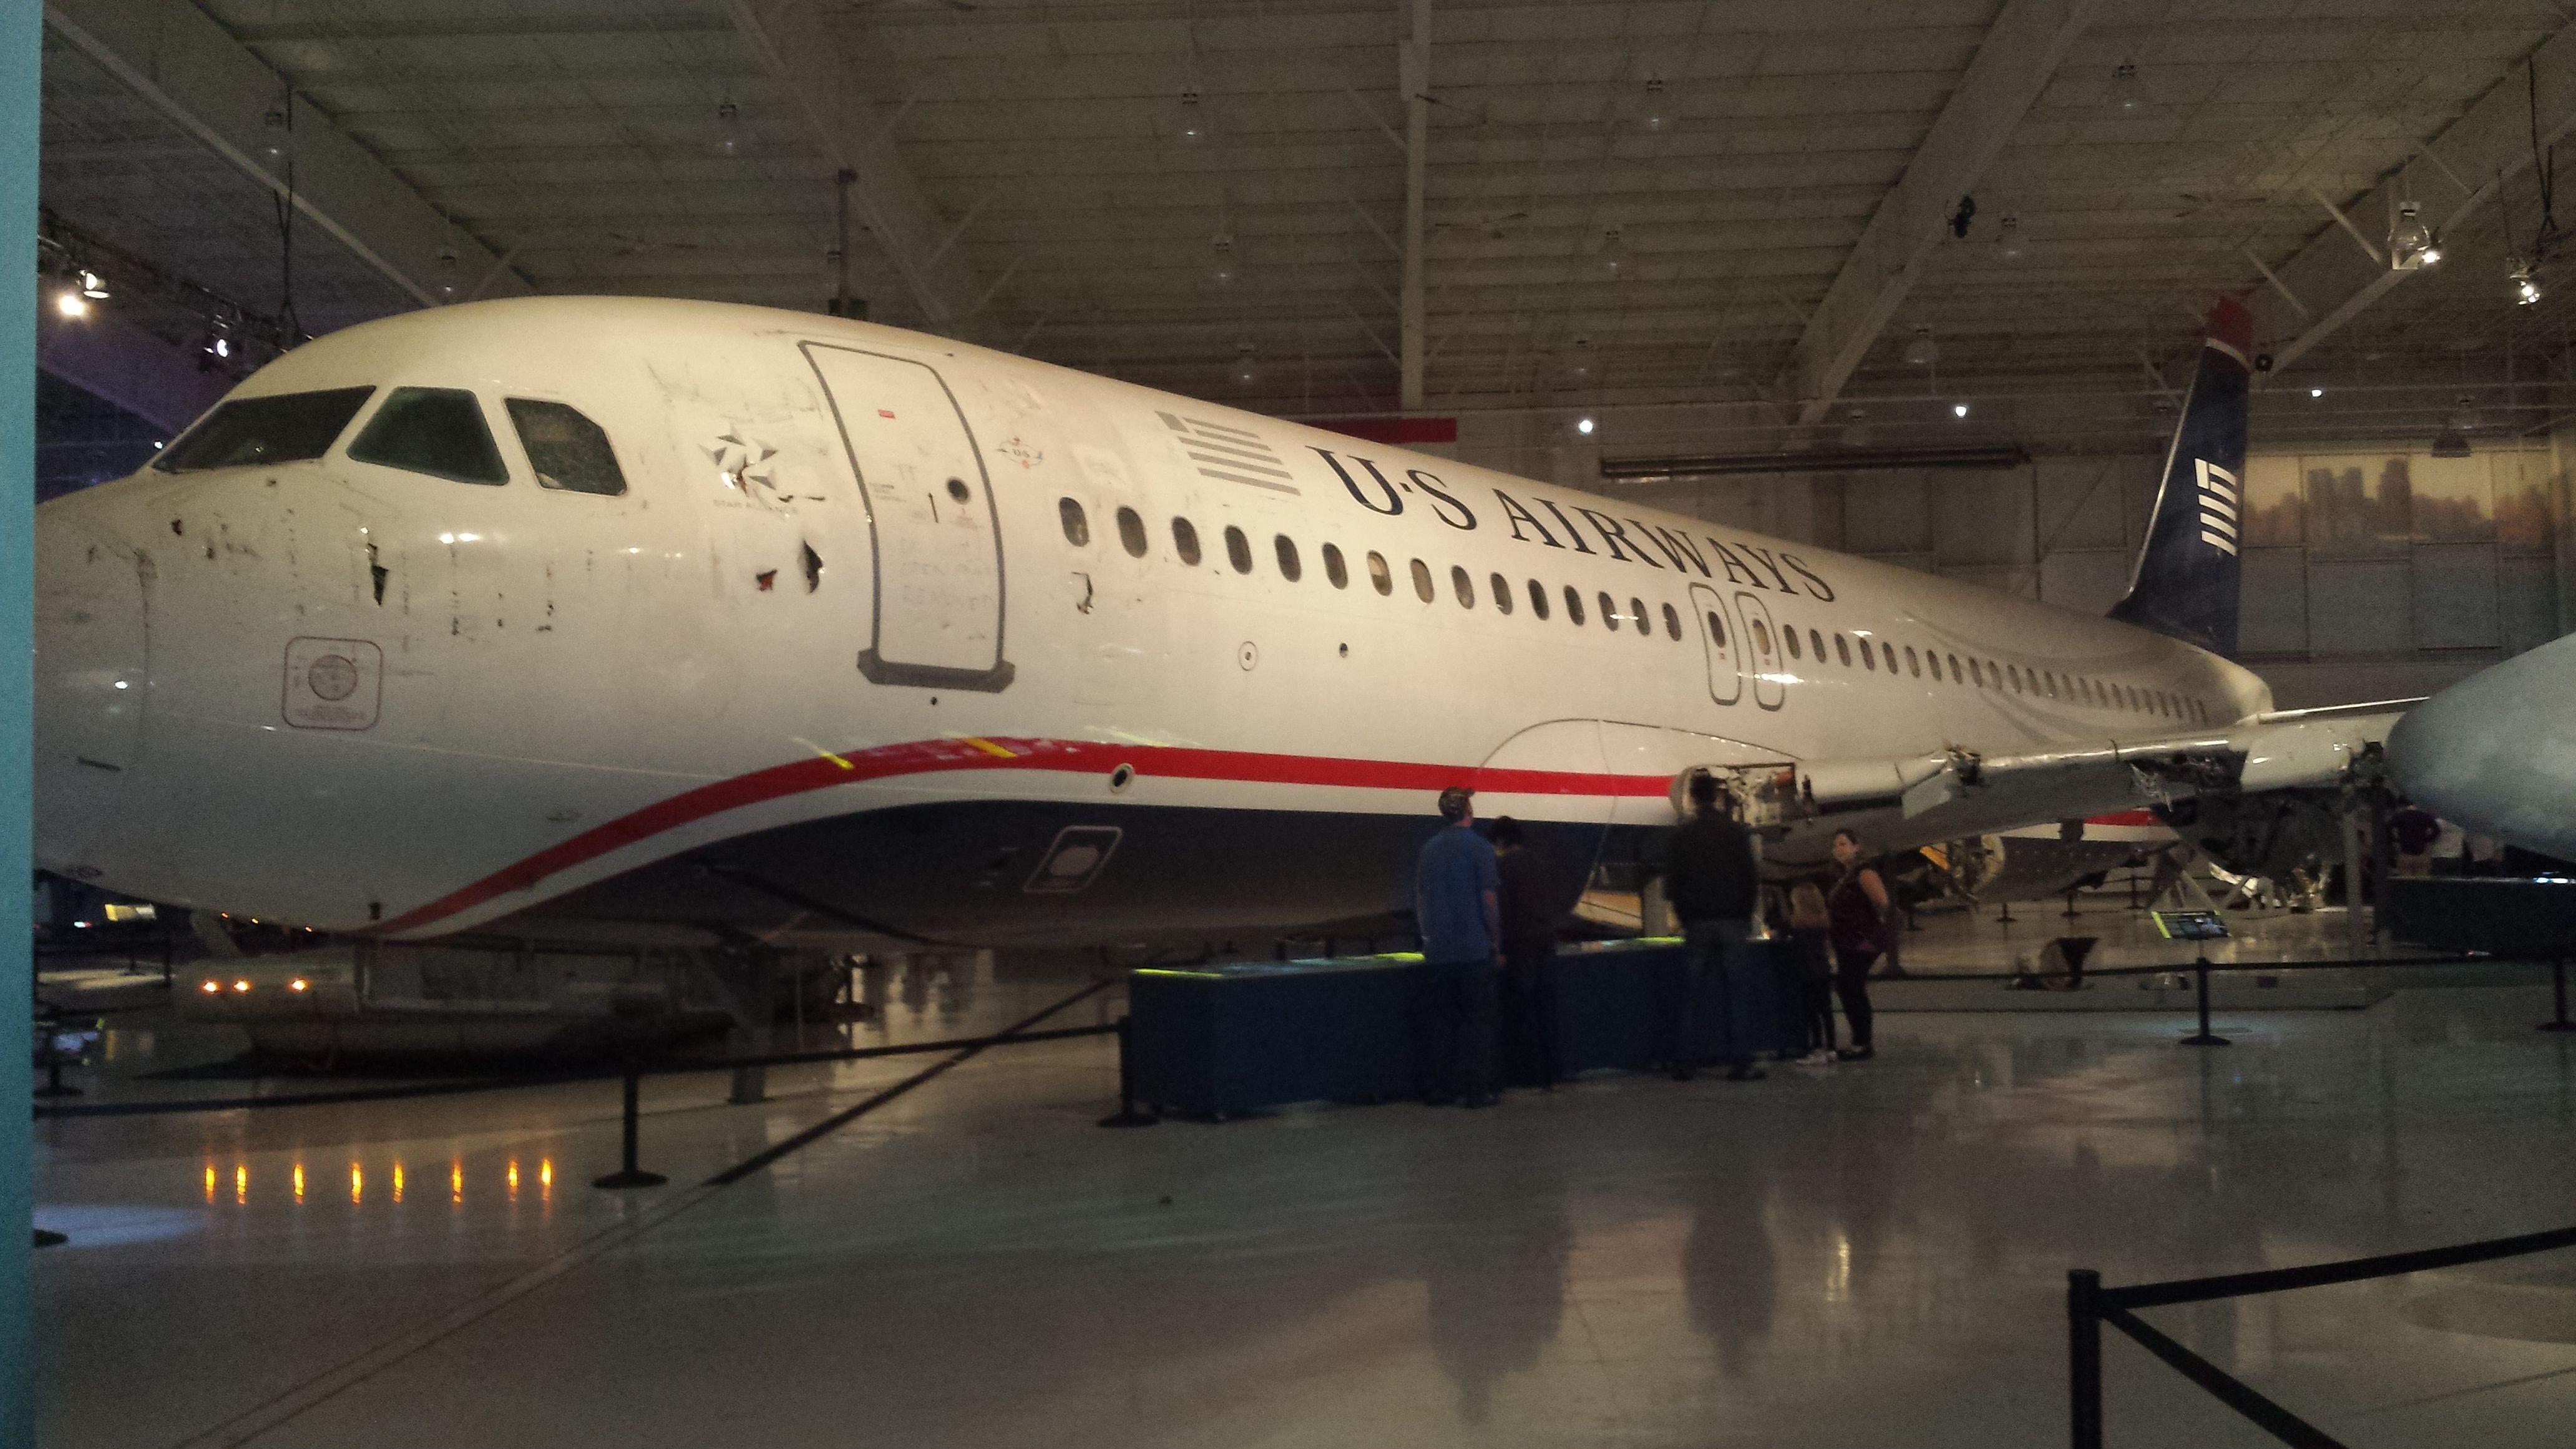 Image result for hudson river plane in museum